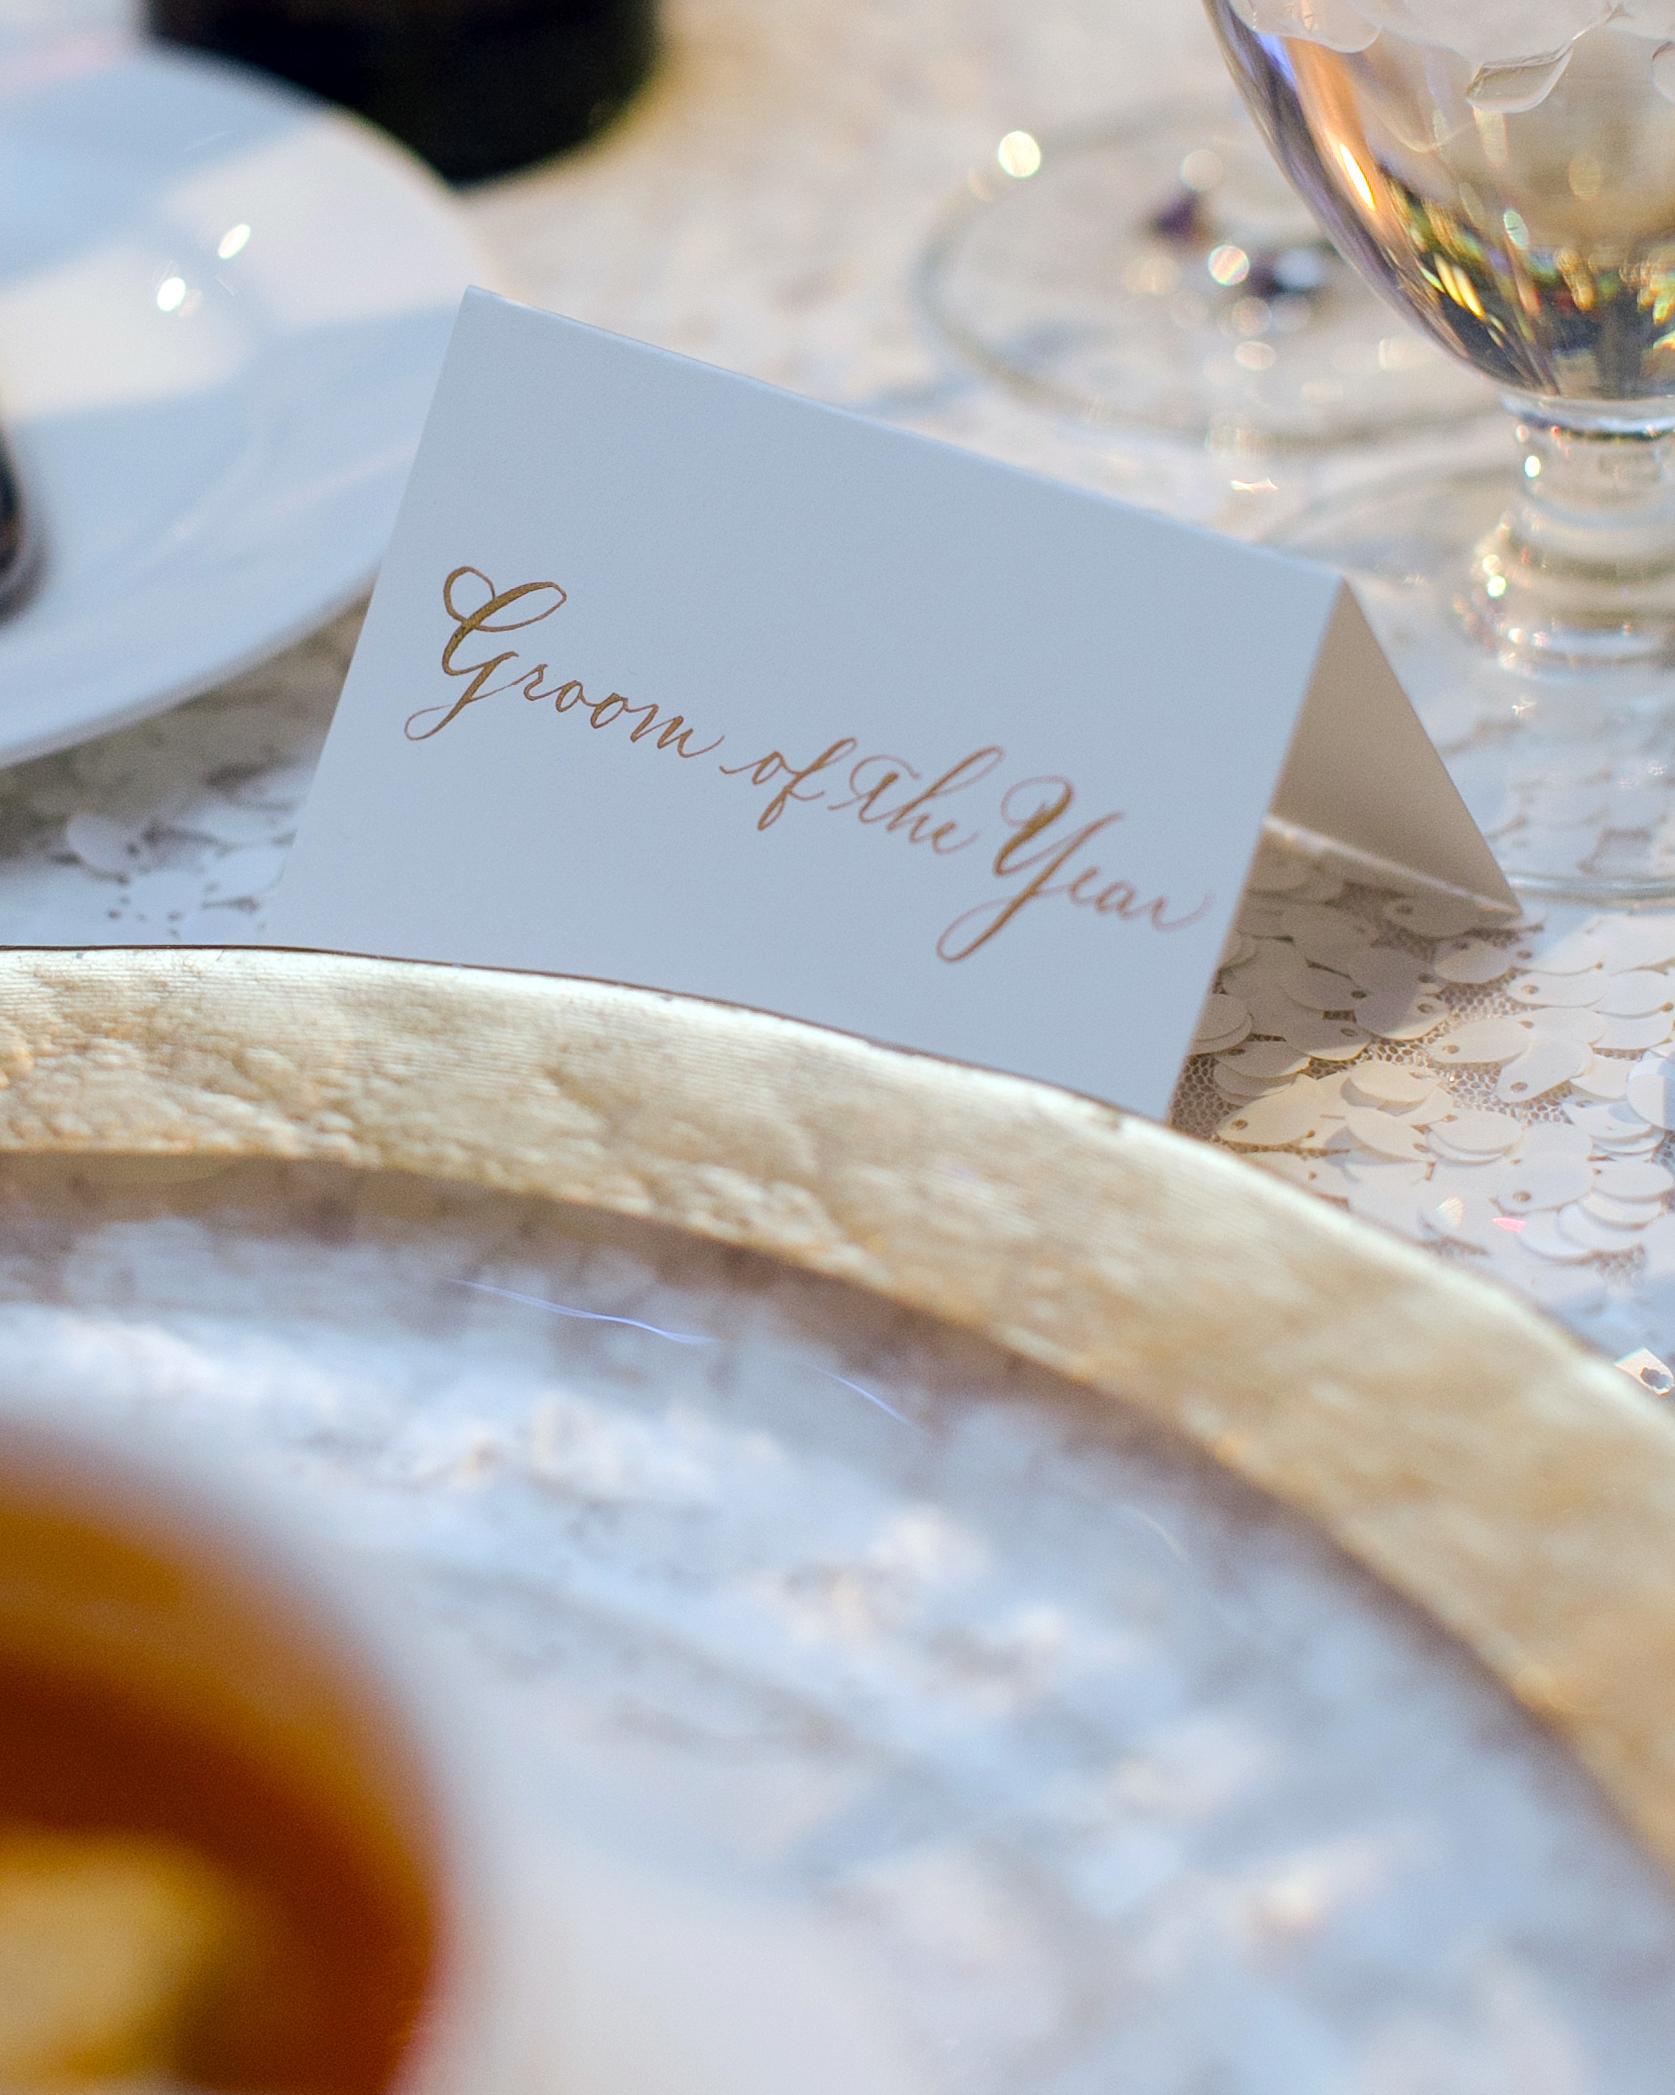 paige-michael-wedding-placecard-1087-s112431-1215.jpg